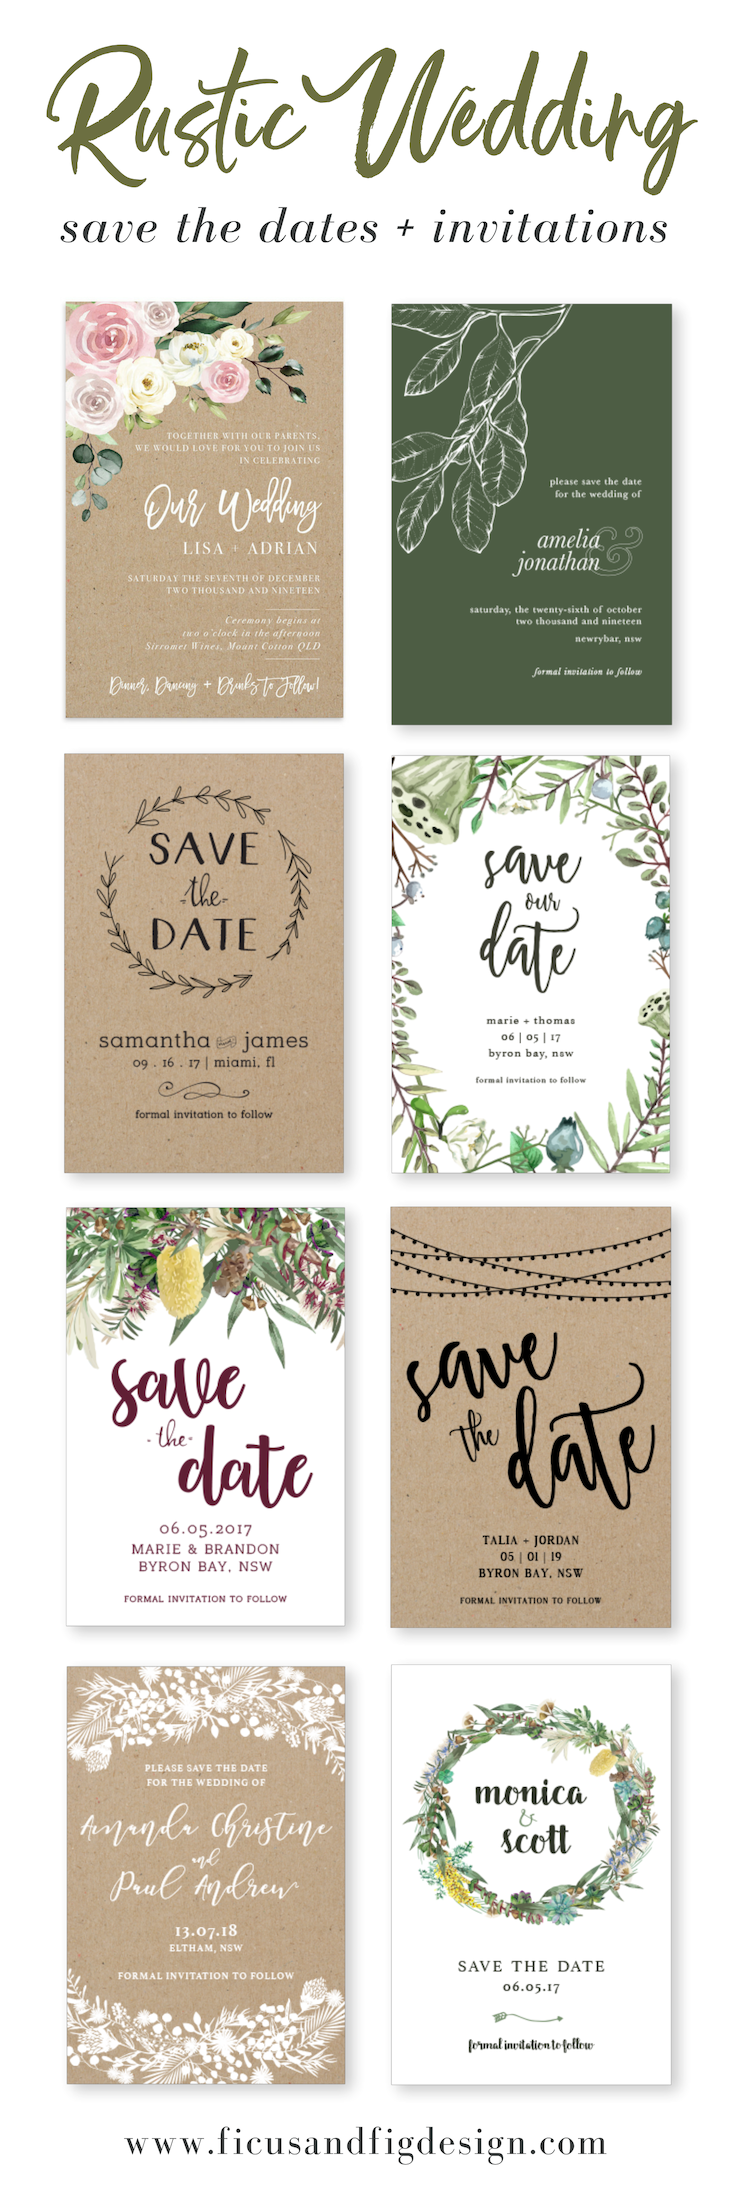 Ficus And Fig Design Custom Wedding Invitations Australia Rustic Wedding Save The In 2020 Wedding Invitations Australia Wedding Saving Rustic Wedding Save The Dates